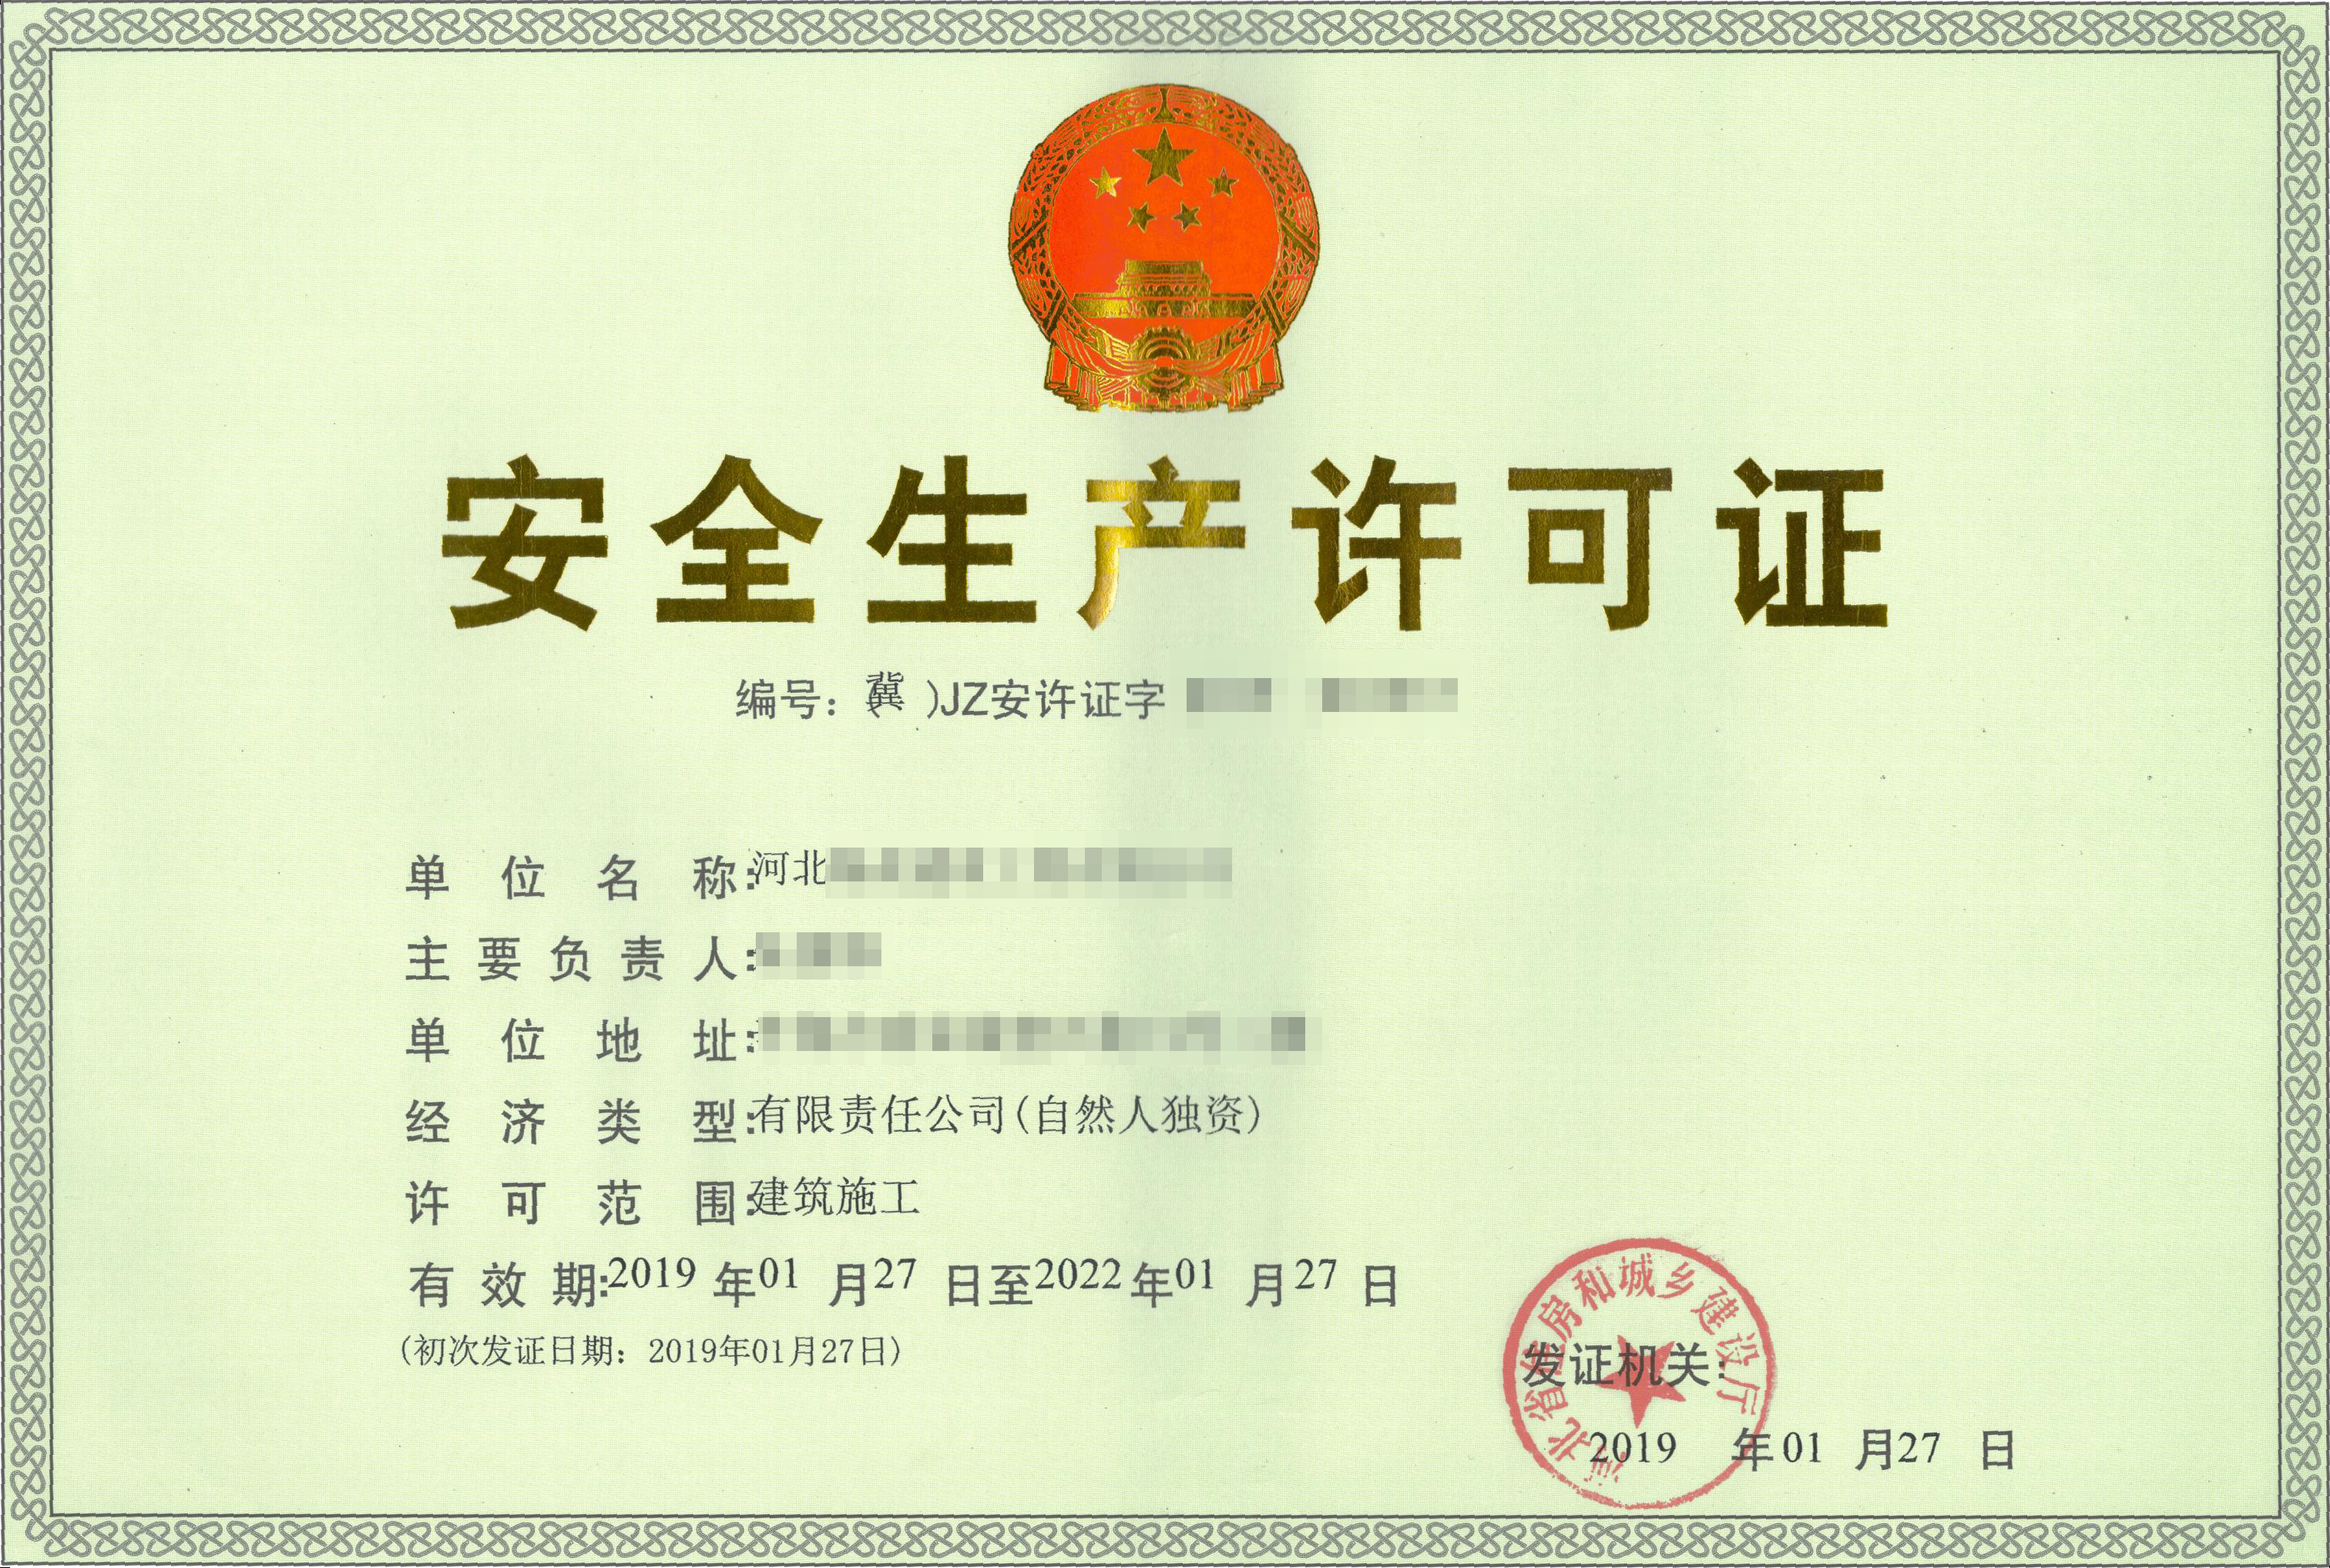 <b>安全生产许可证</b>